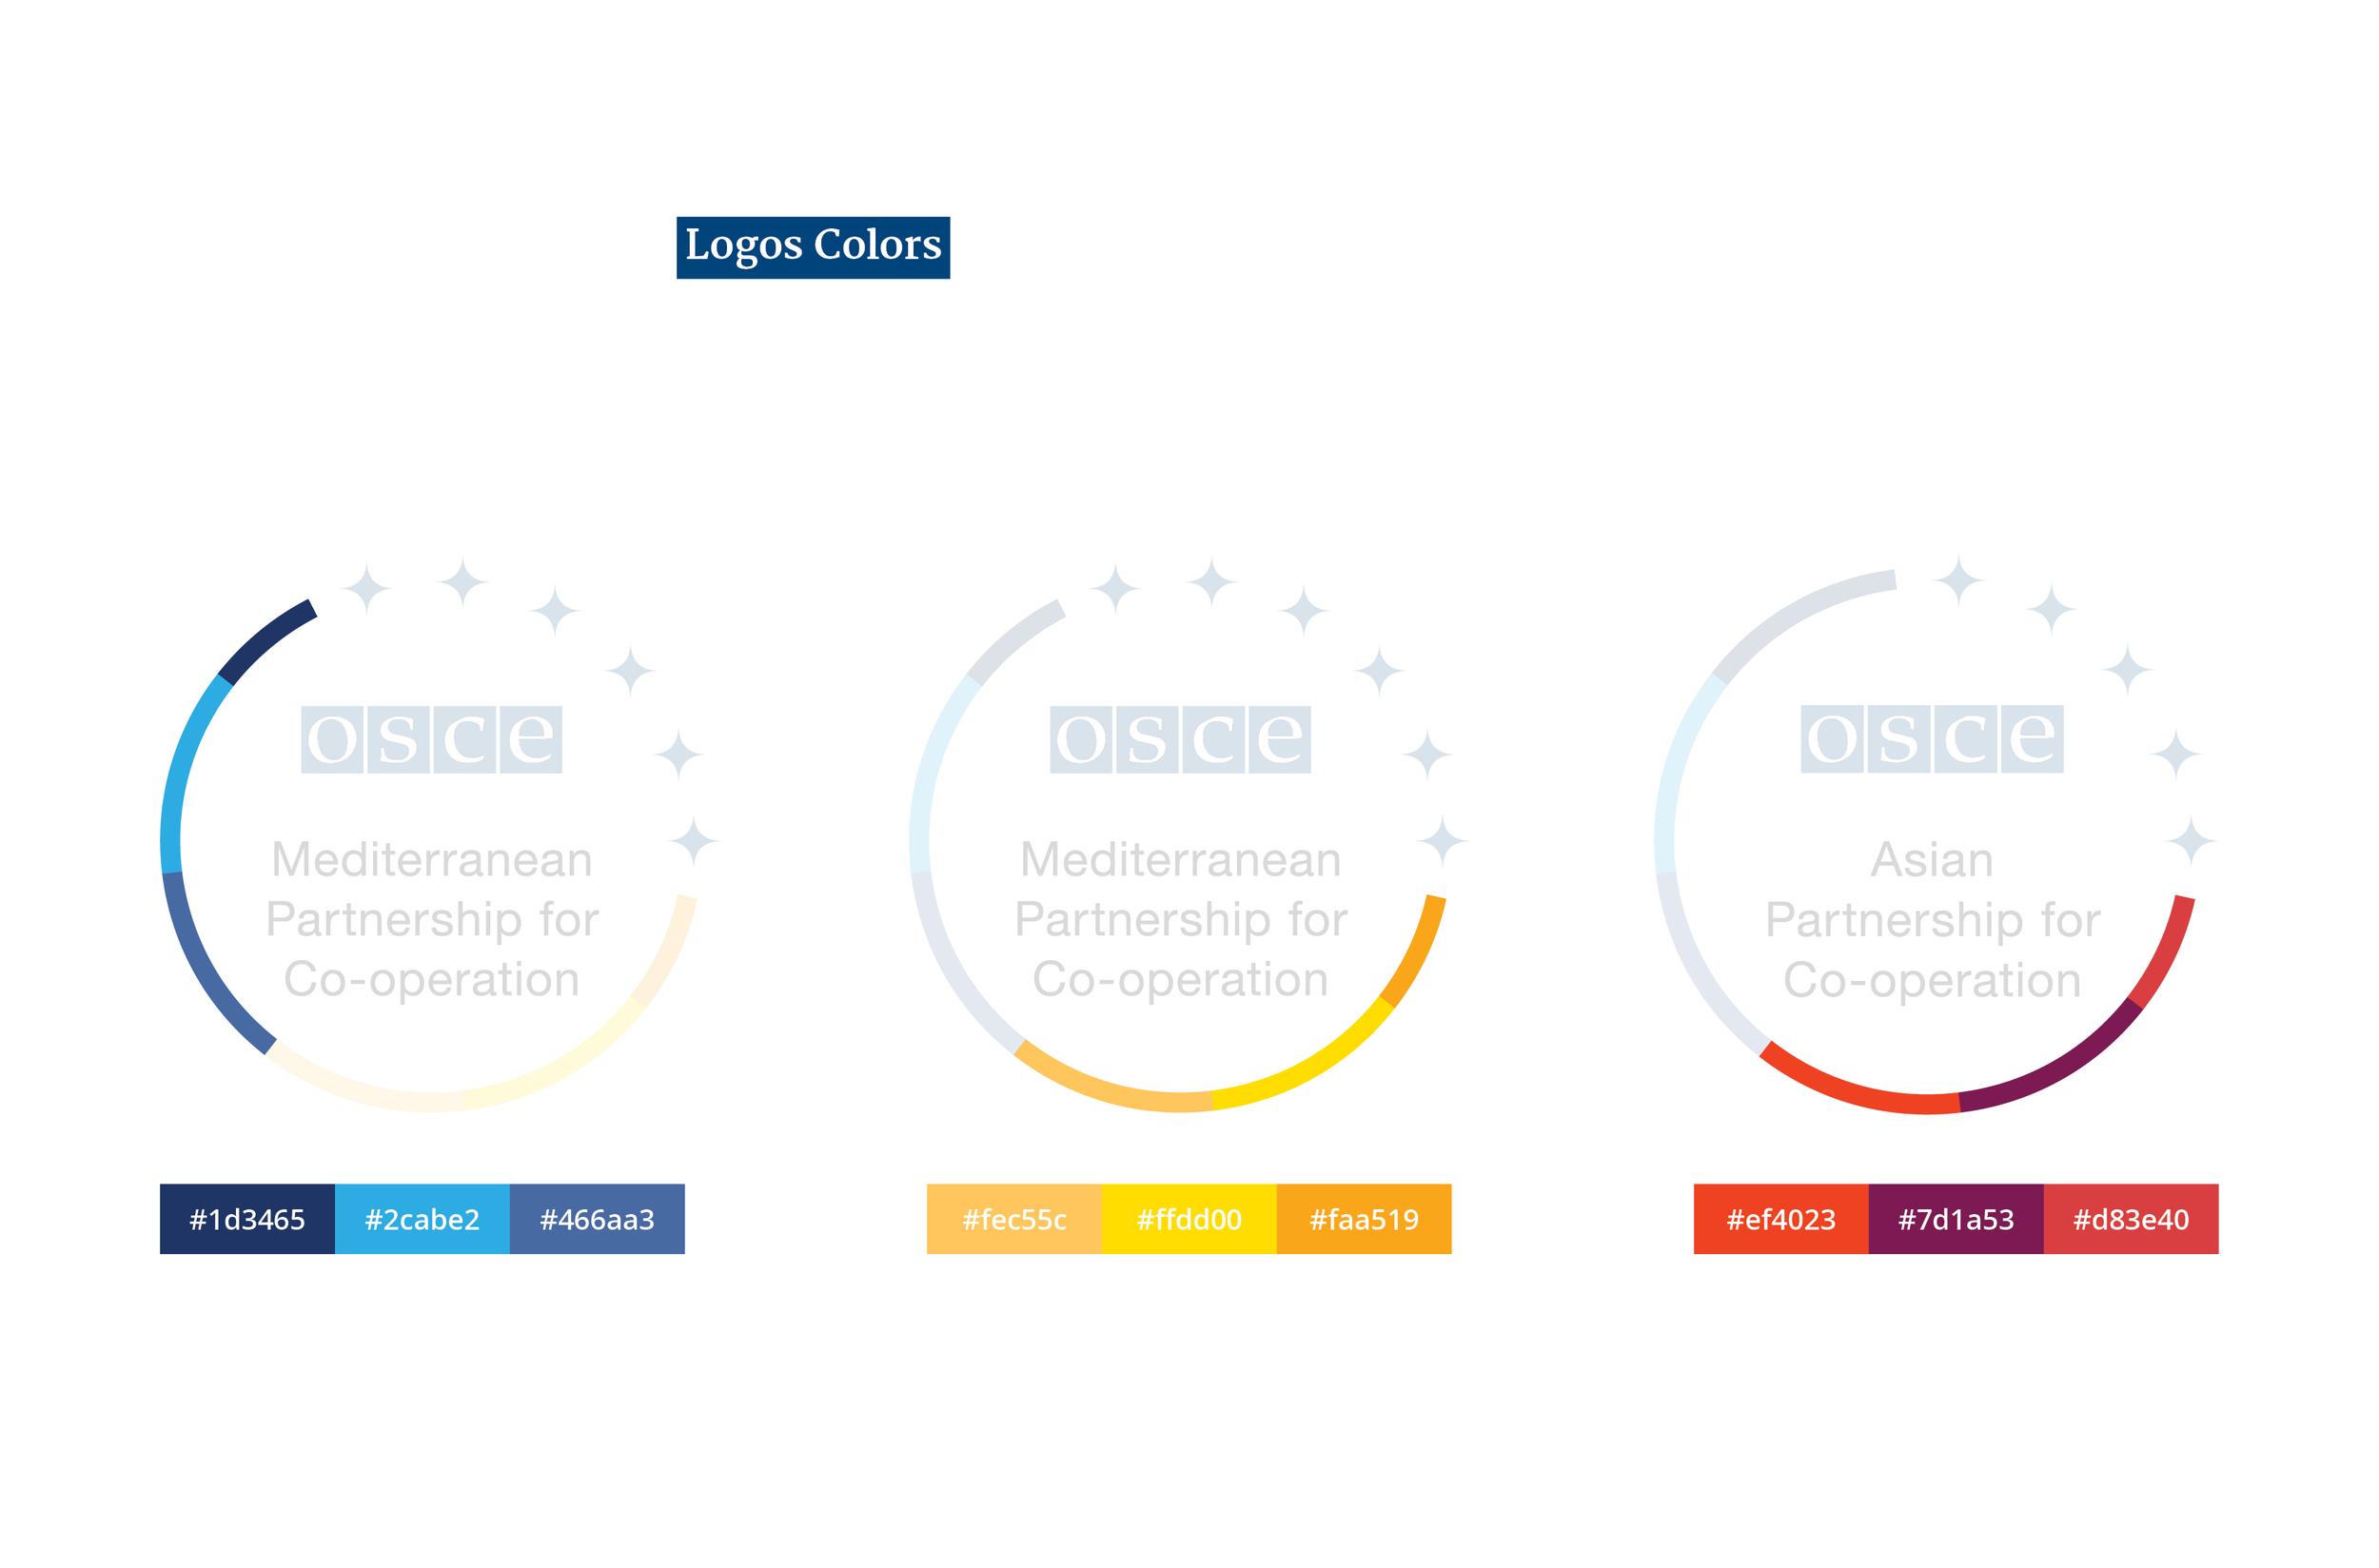 OSCE_Partnership_Logo_Graphic_Charter_3110168.png